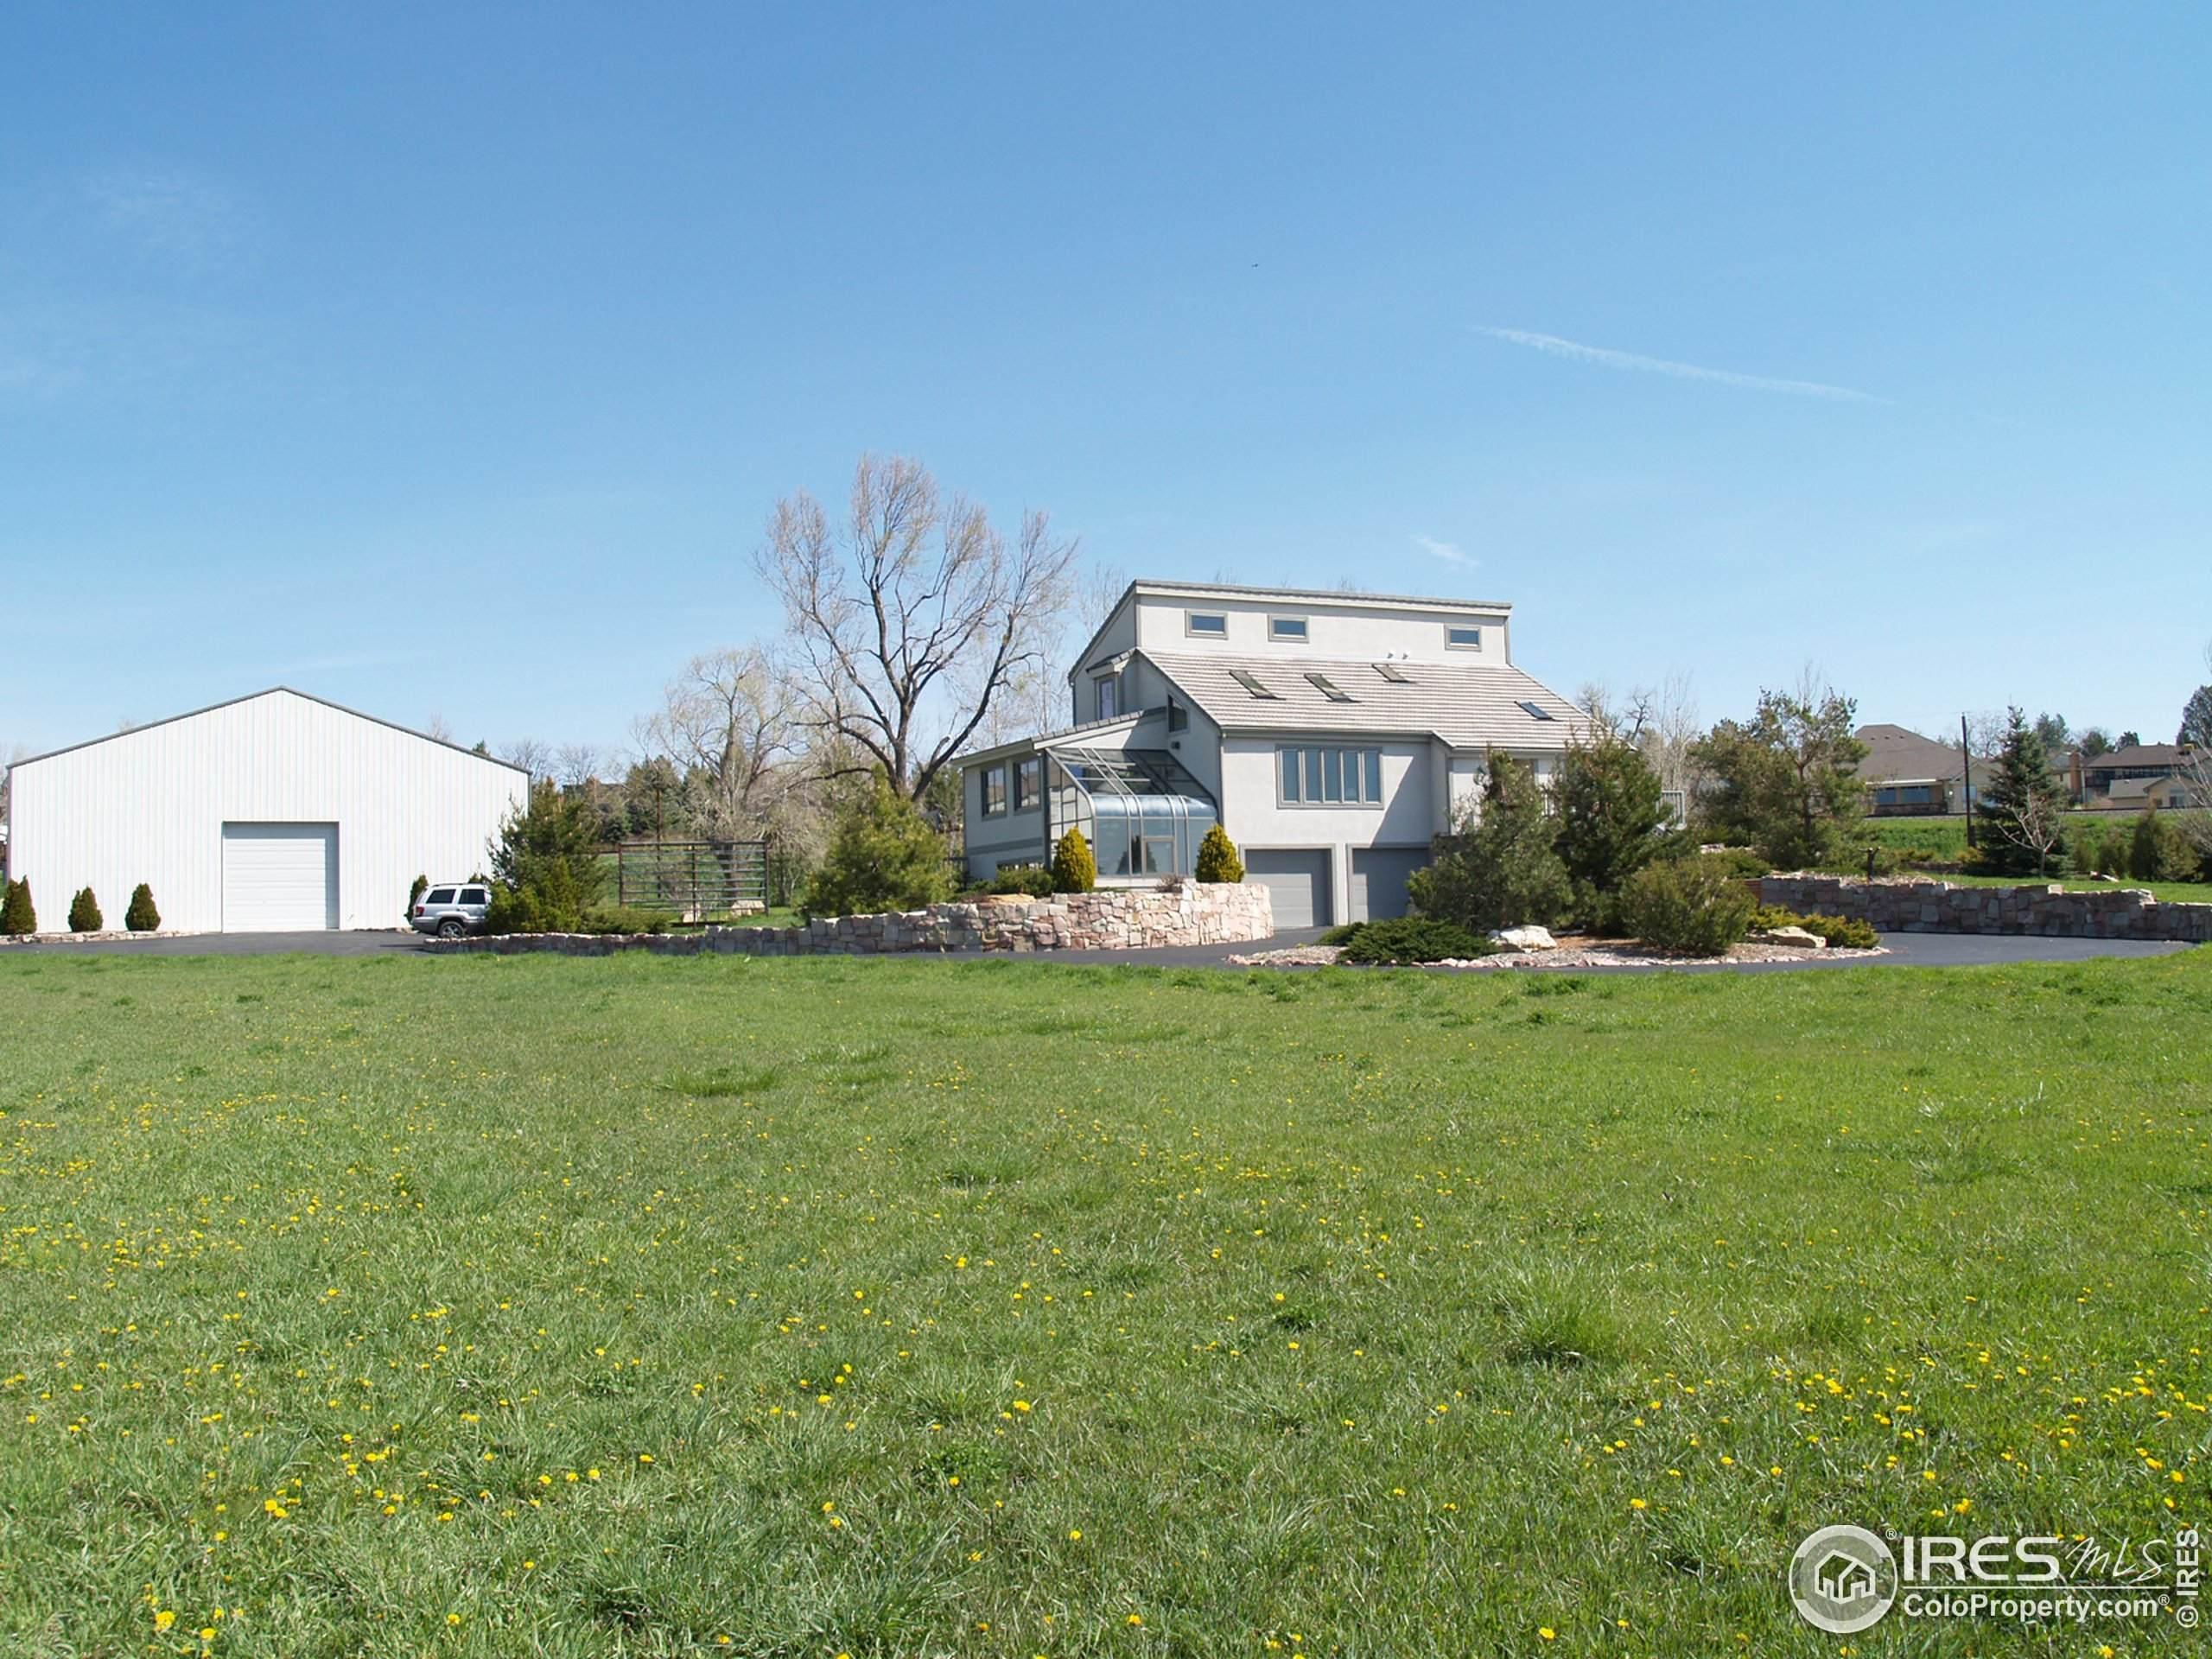 2109 Brooks Way, Longmont, CO 80504 (MLS #928528) :: 8z Real Estate